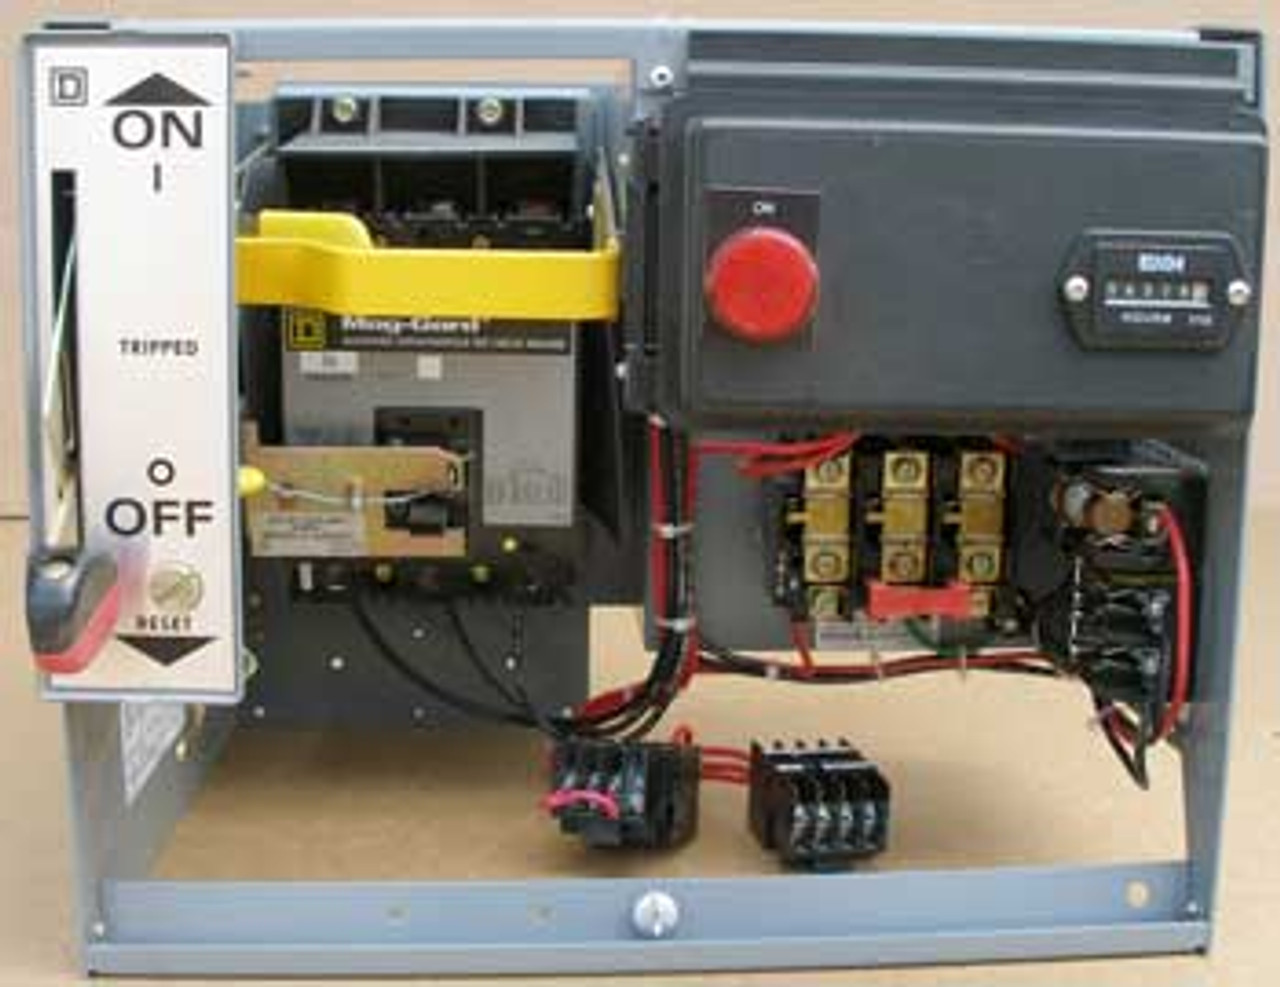 Square D Model 5 Size 1 Nema 15 Amp 600 Volts Motor Control Bucket - Used